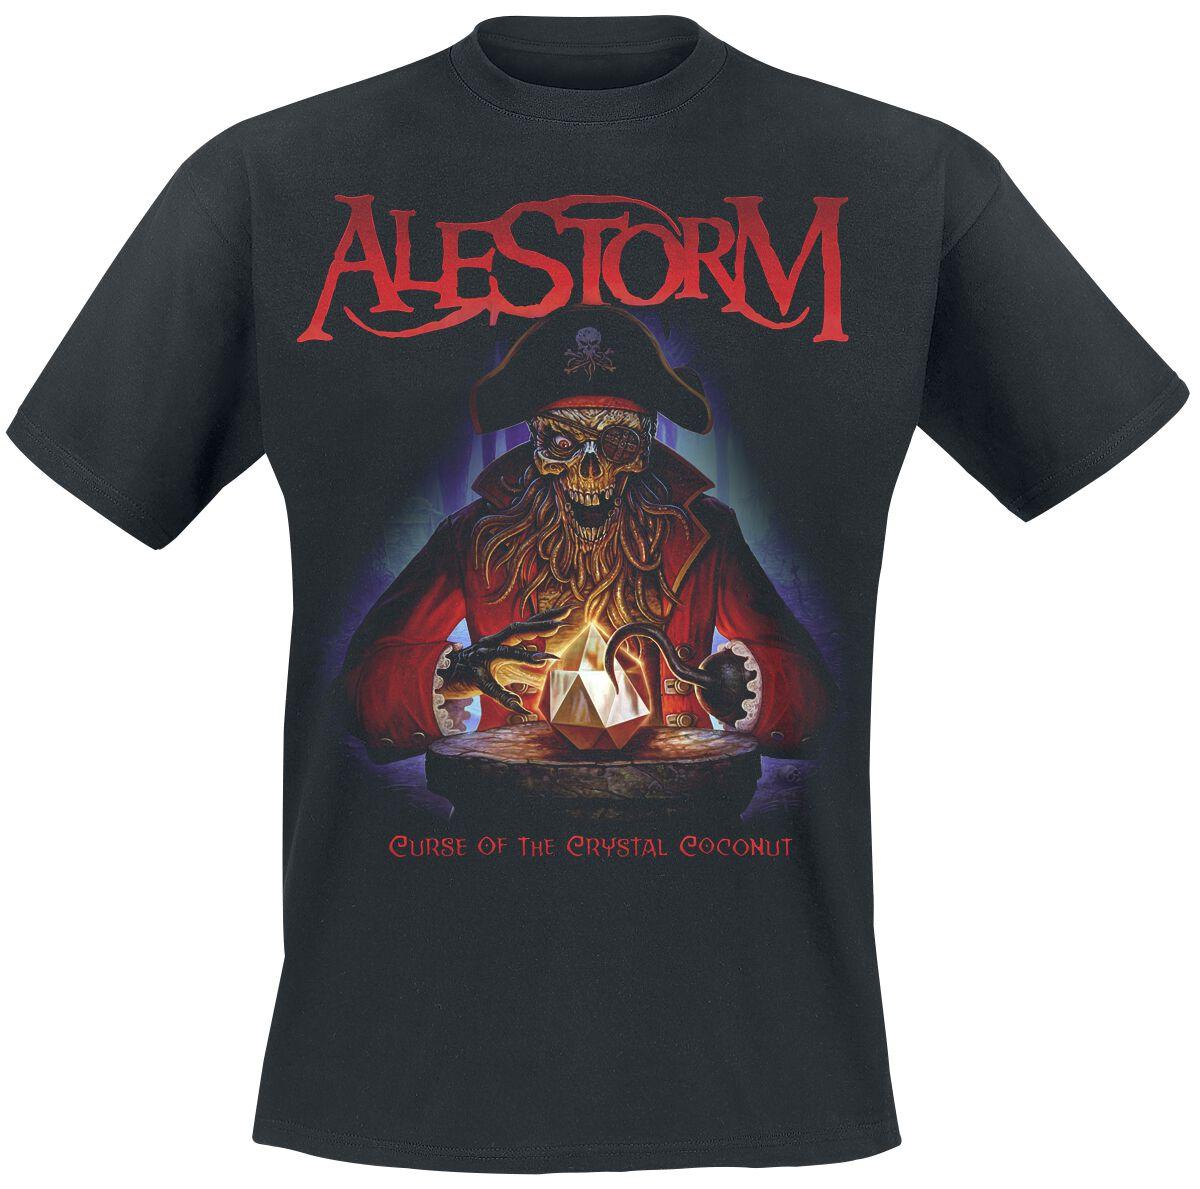 Image of Alestorm Curse Of The Crystal Coconut T-Shirt schwarz